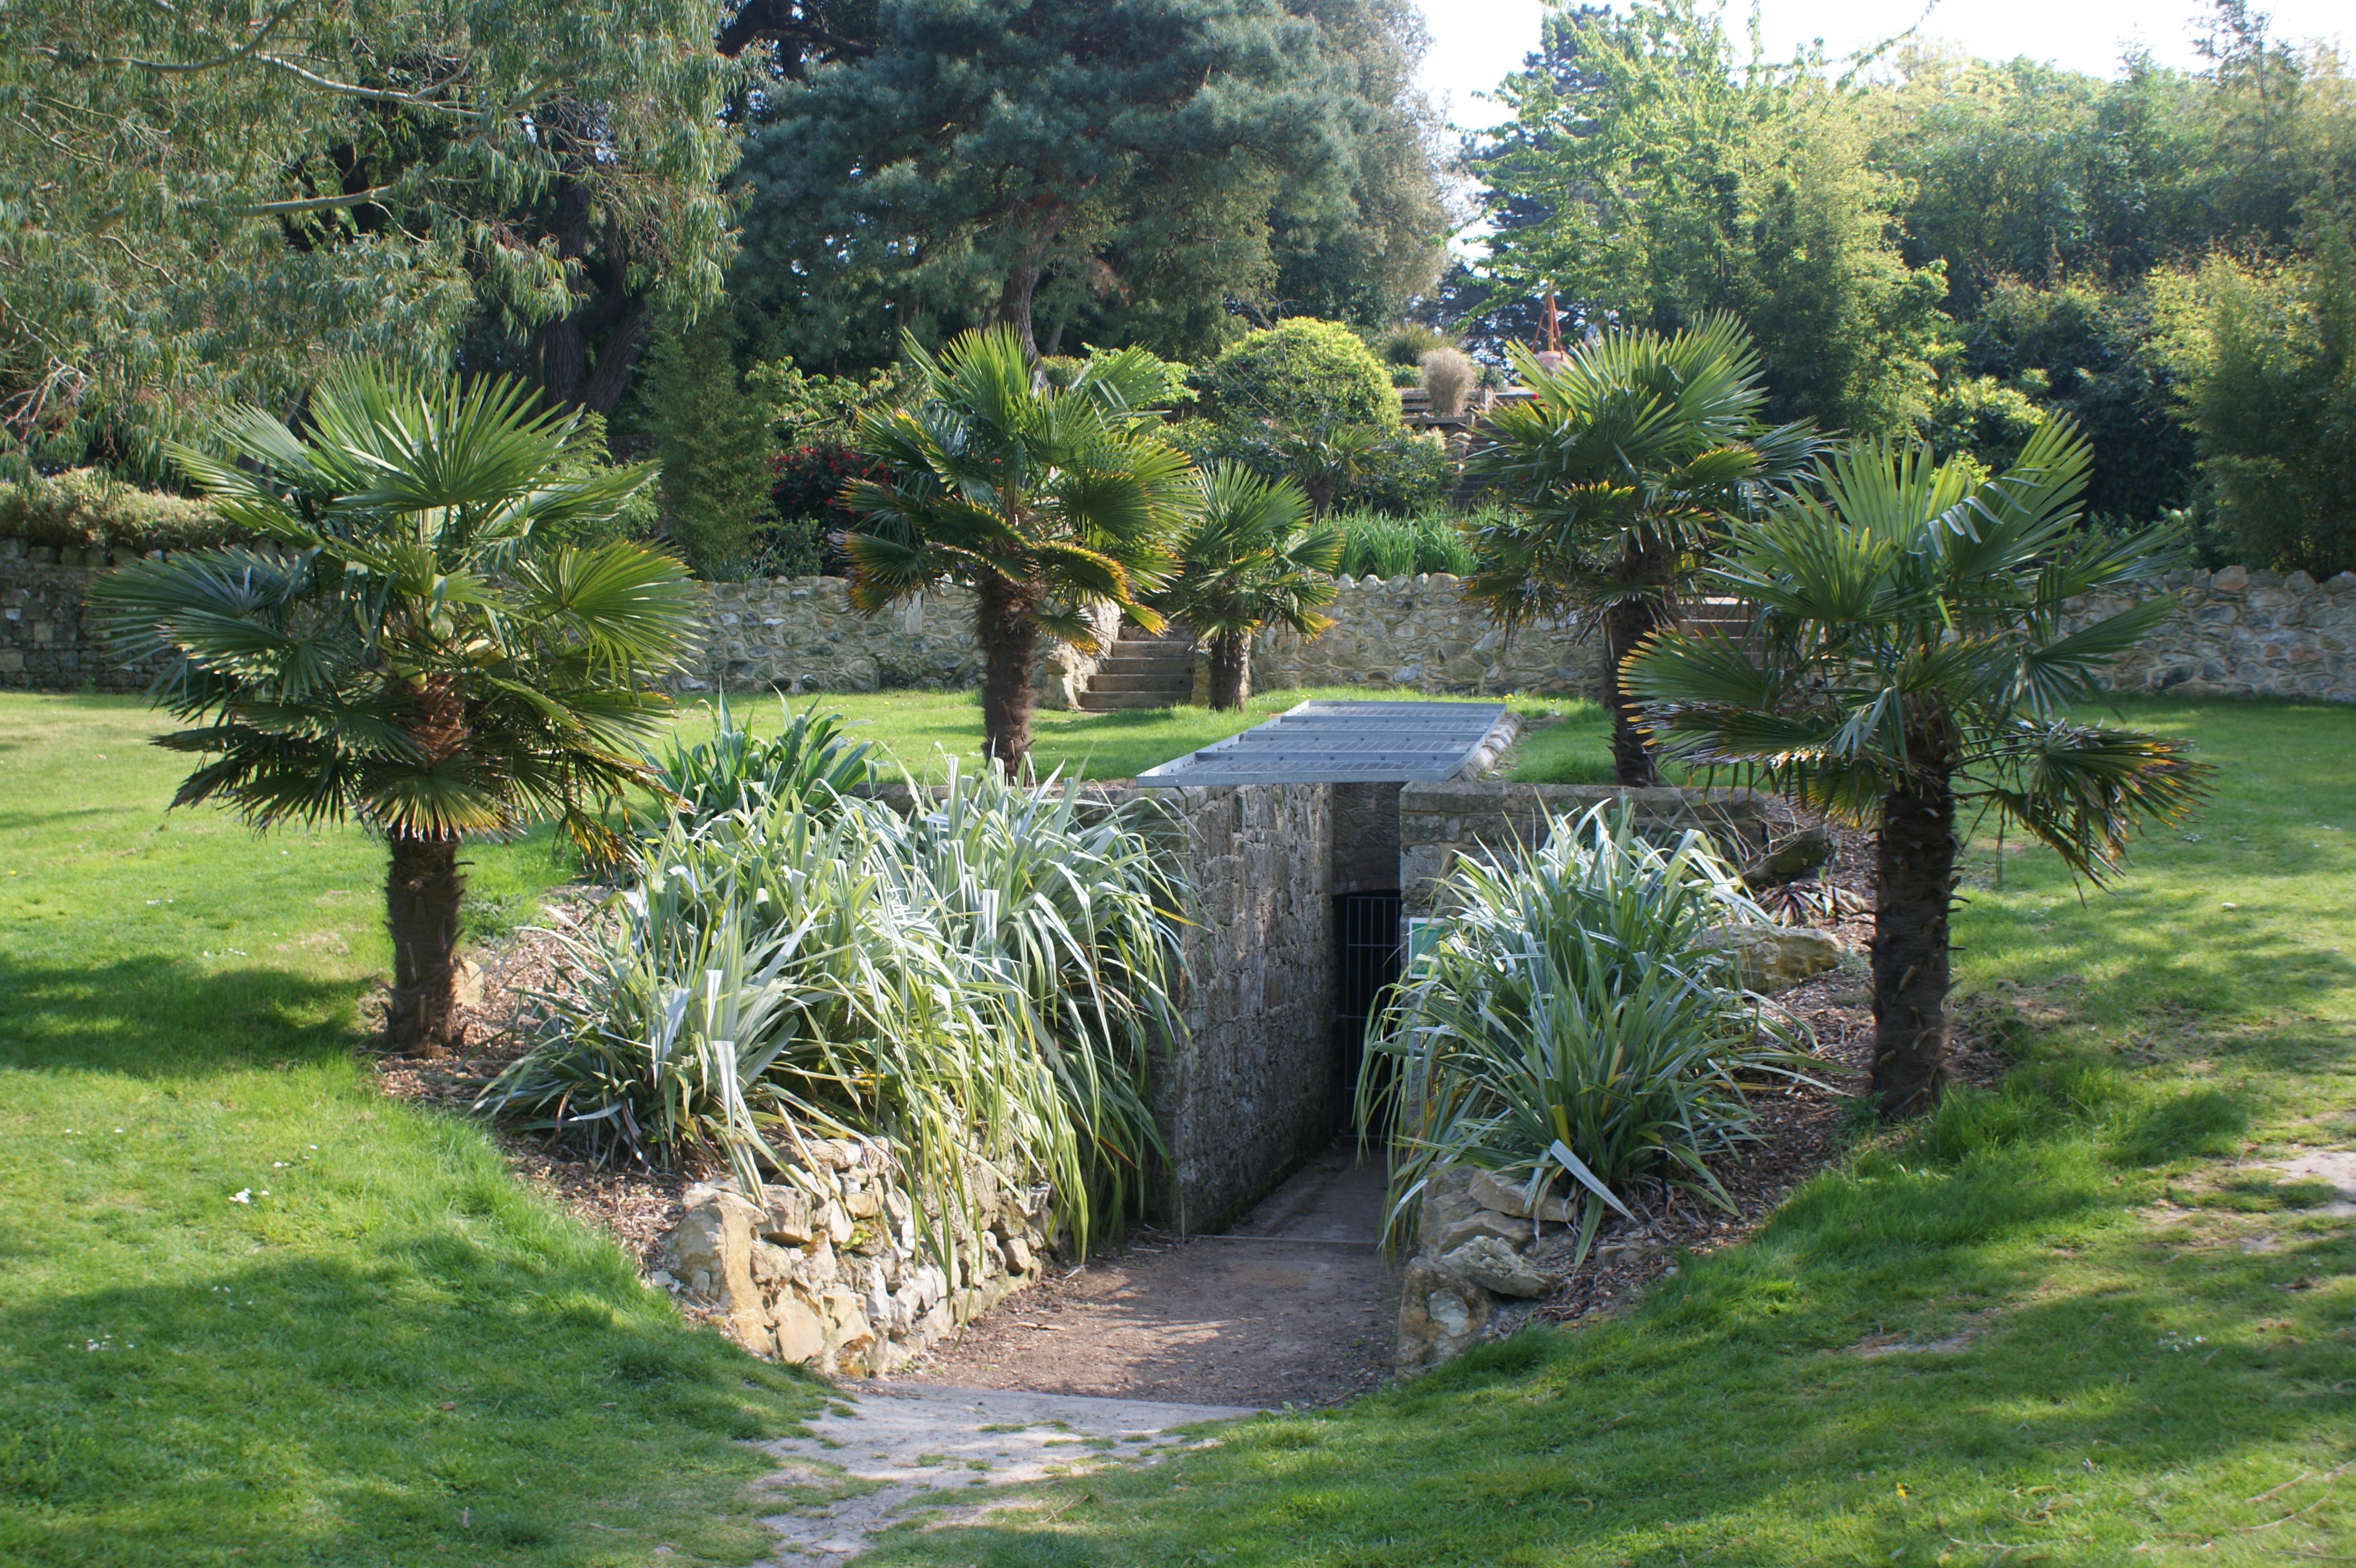 Http Commons Wikimedia Org Wiki File Ventnor Botanic Garden Underground Tunnel Jpg